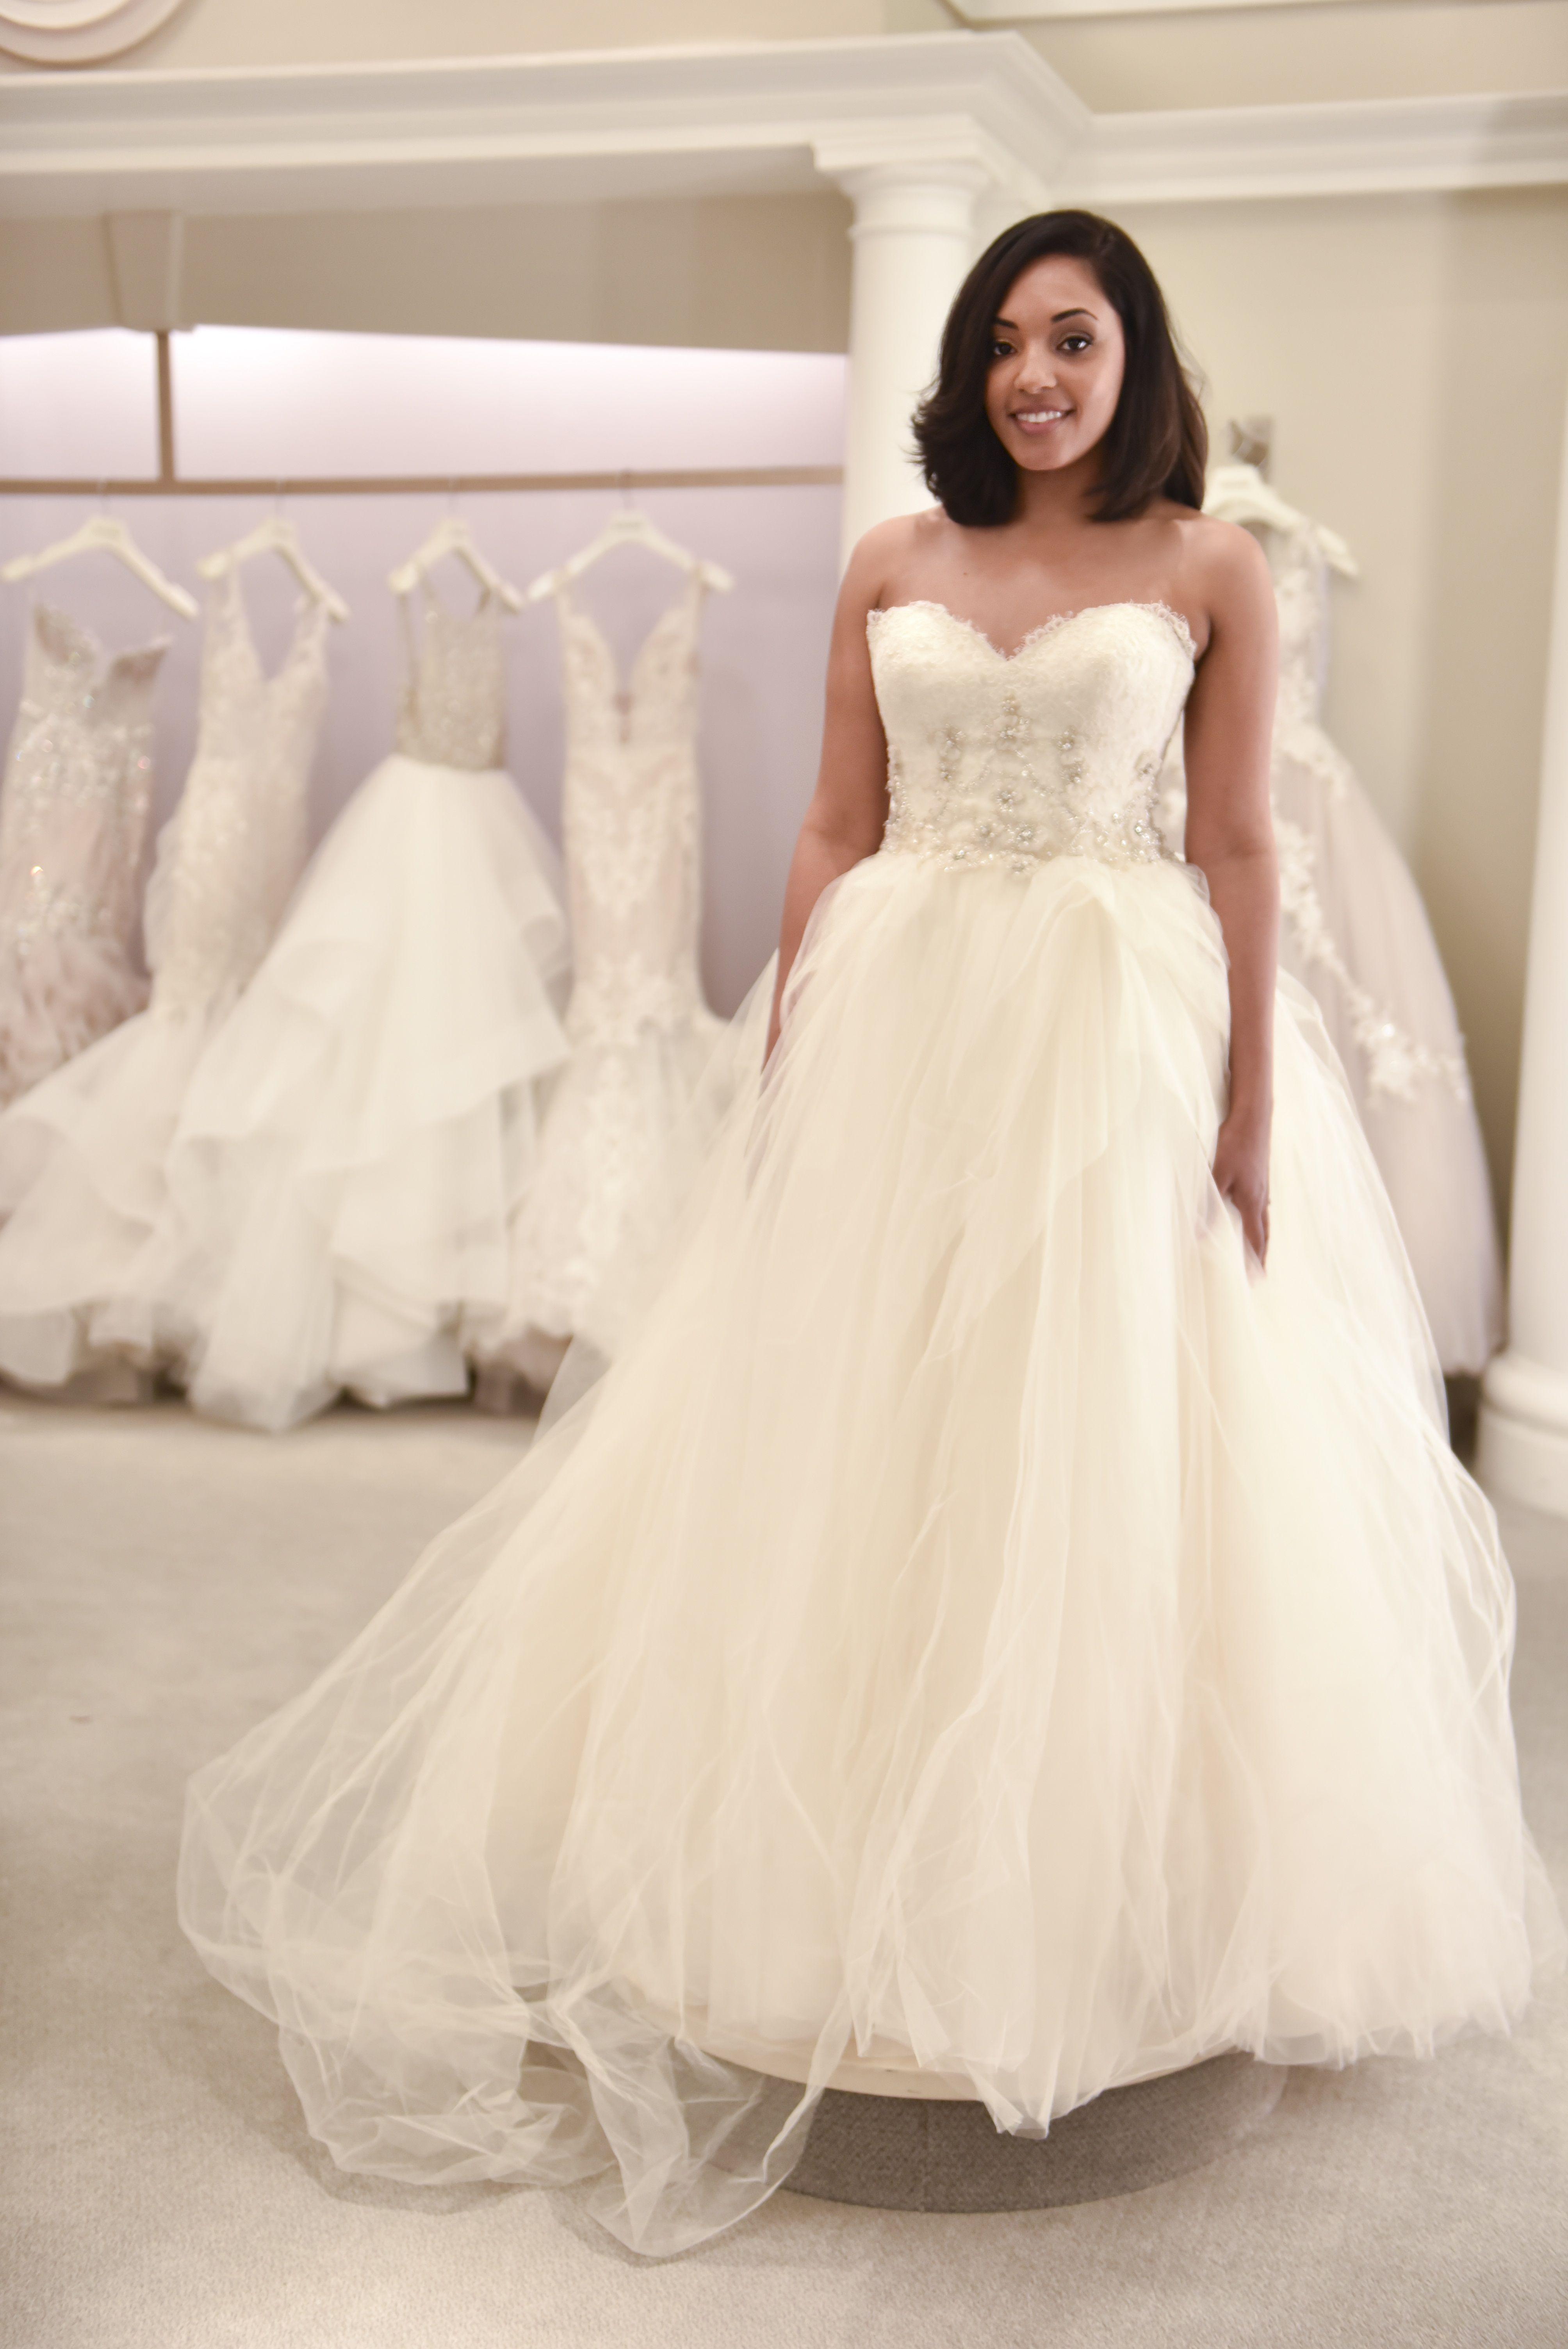 Help Plan The Knot Dream Wedding Dream wedding dresses